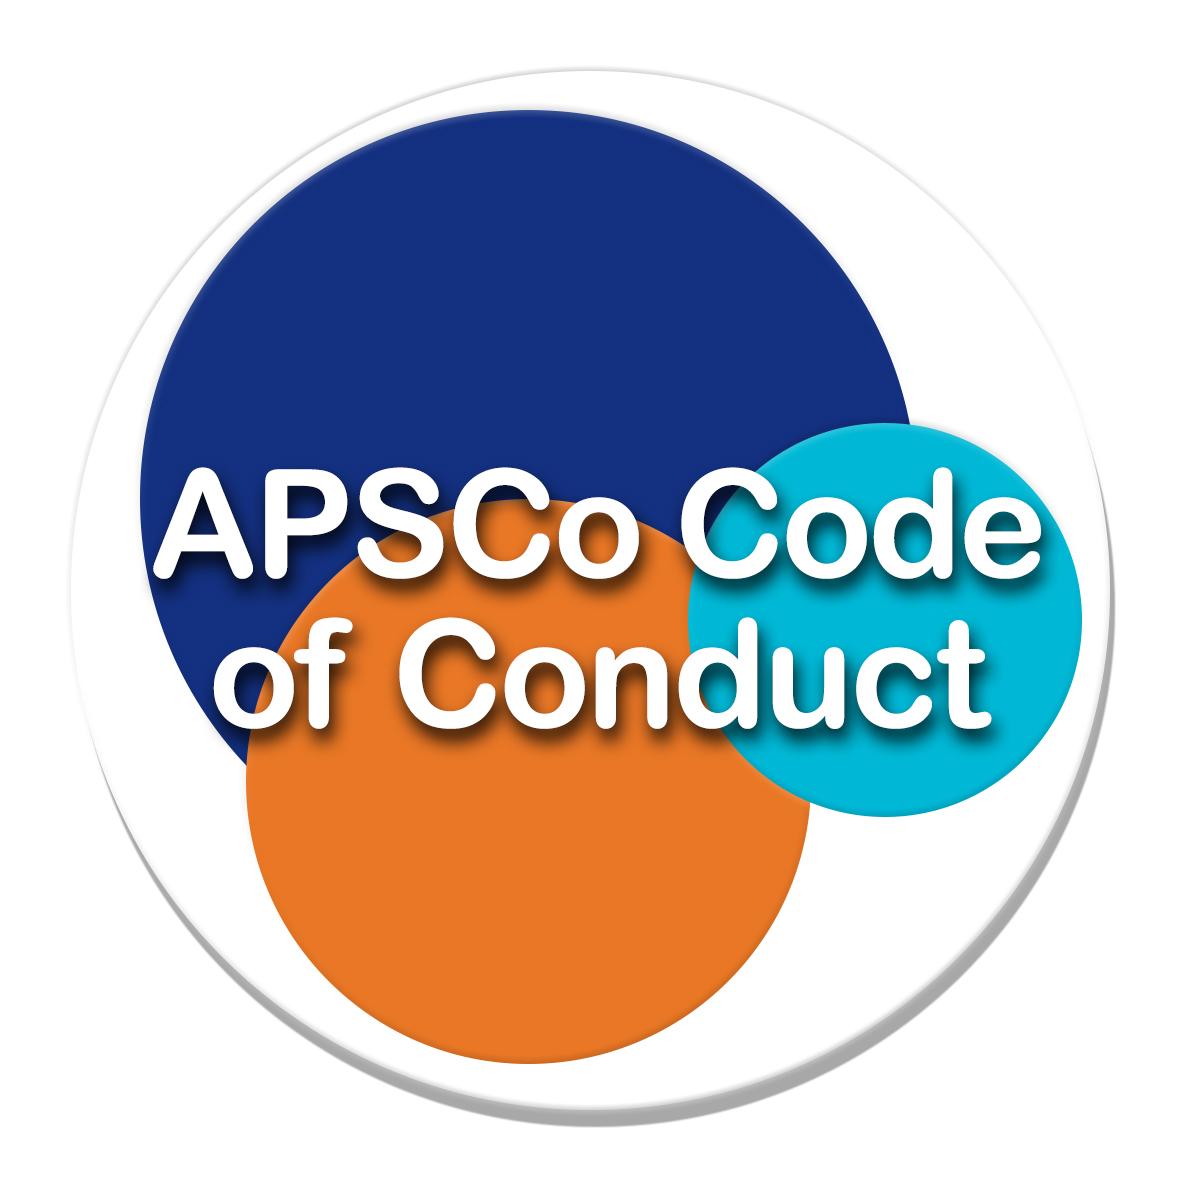 Explaining expectations becoming of an APSCo Global Member in Australia